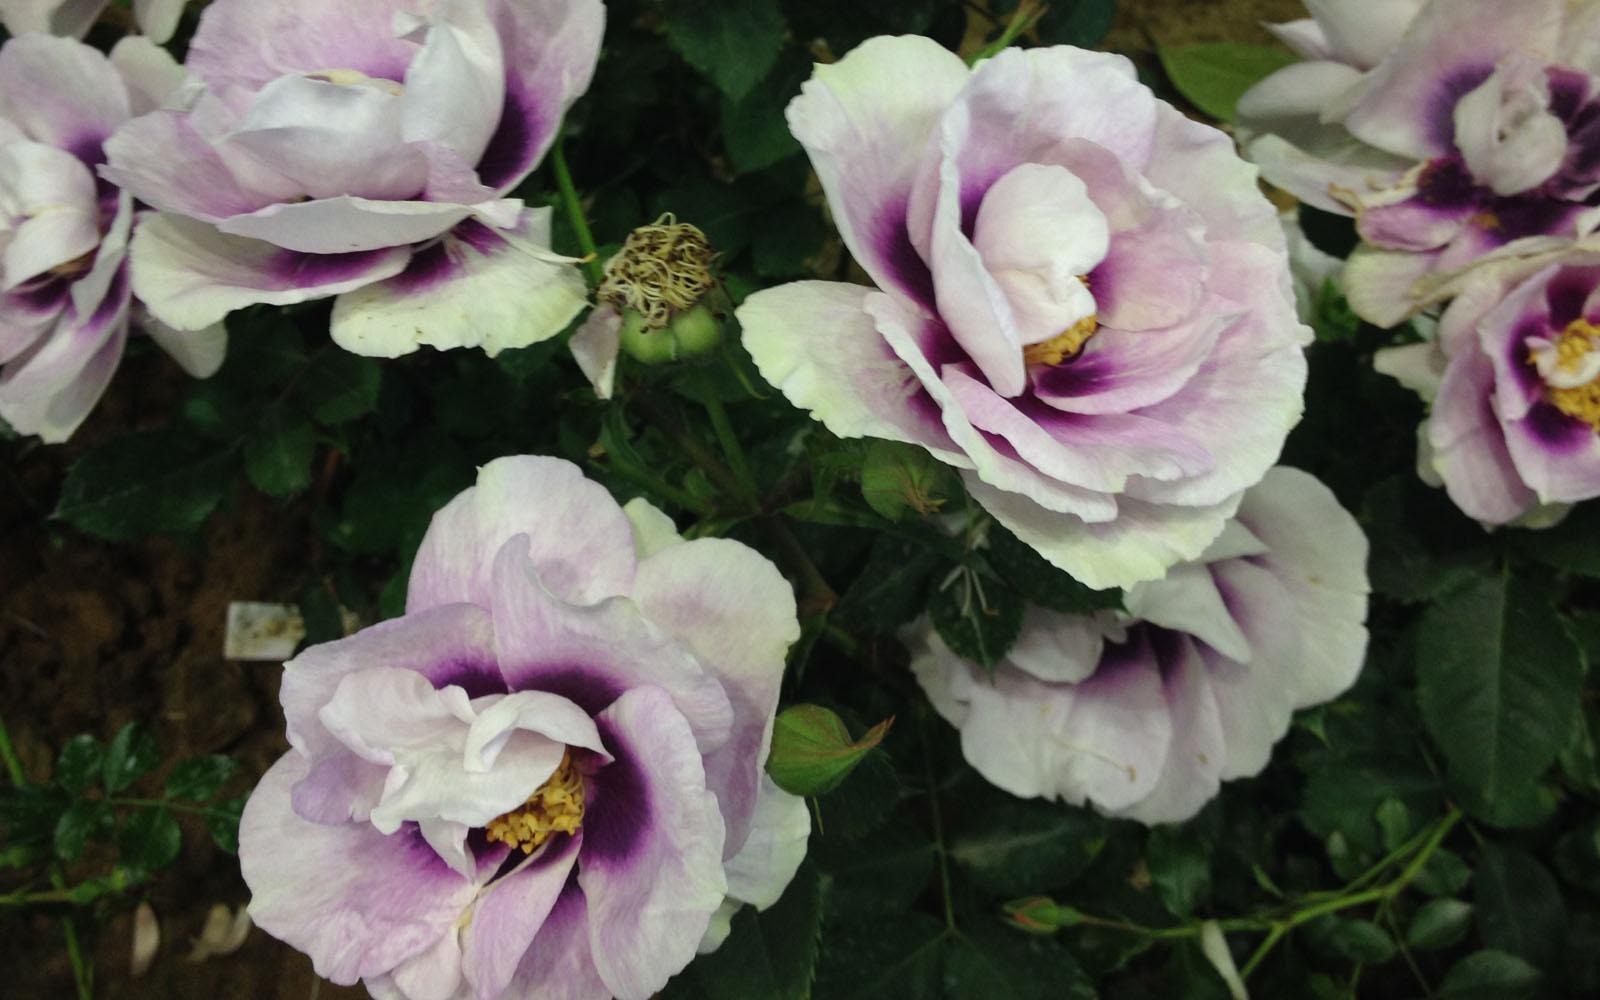 Rosa Occhi per Te.